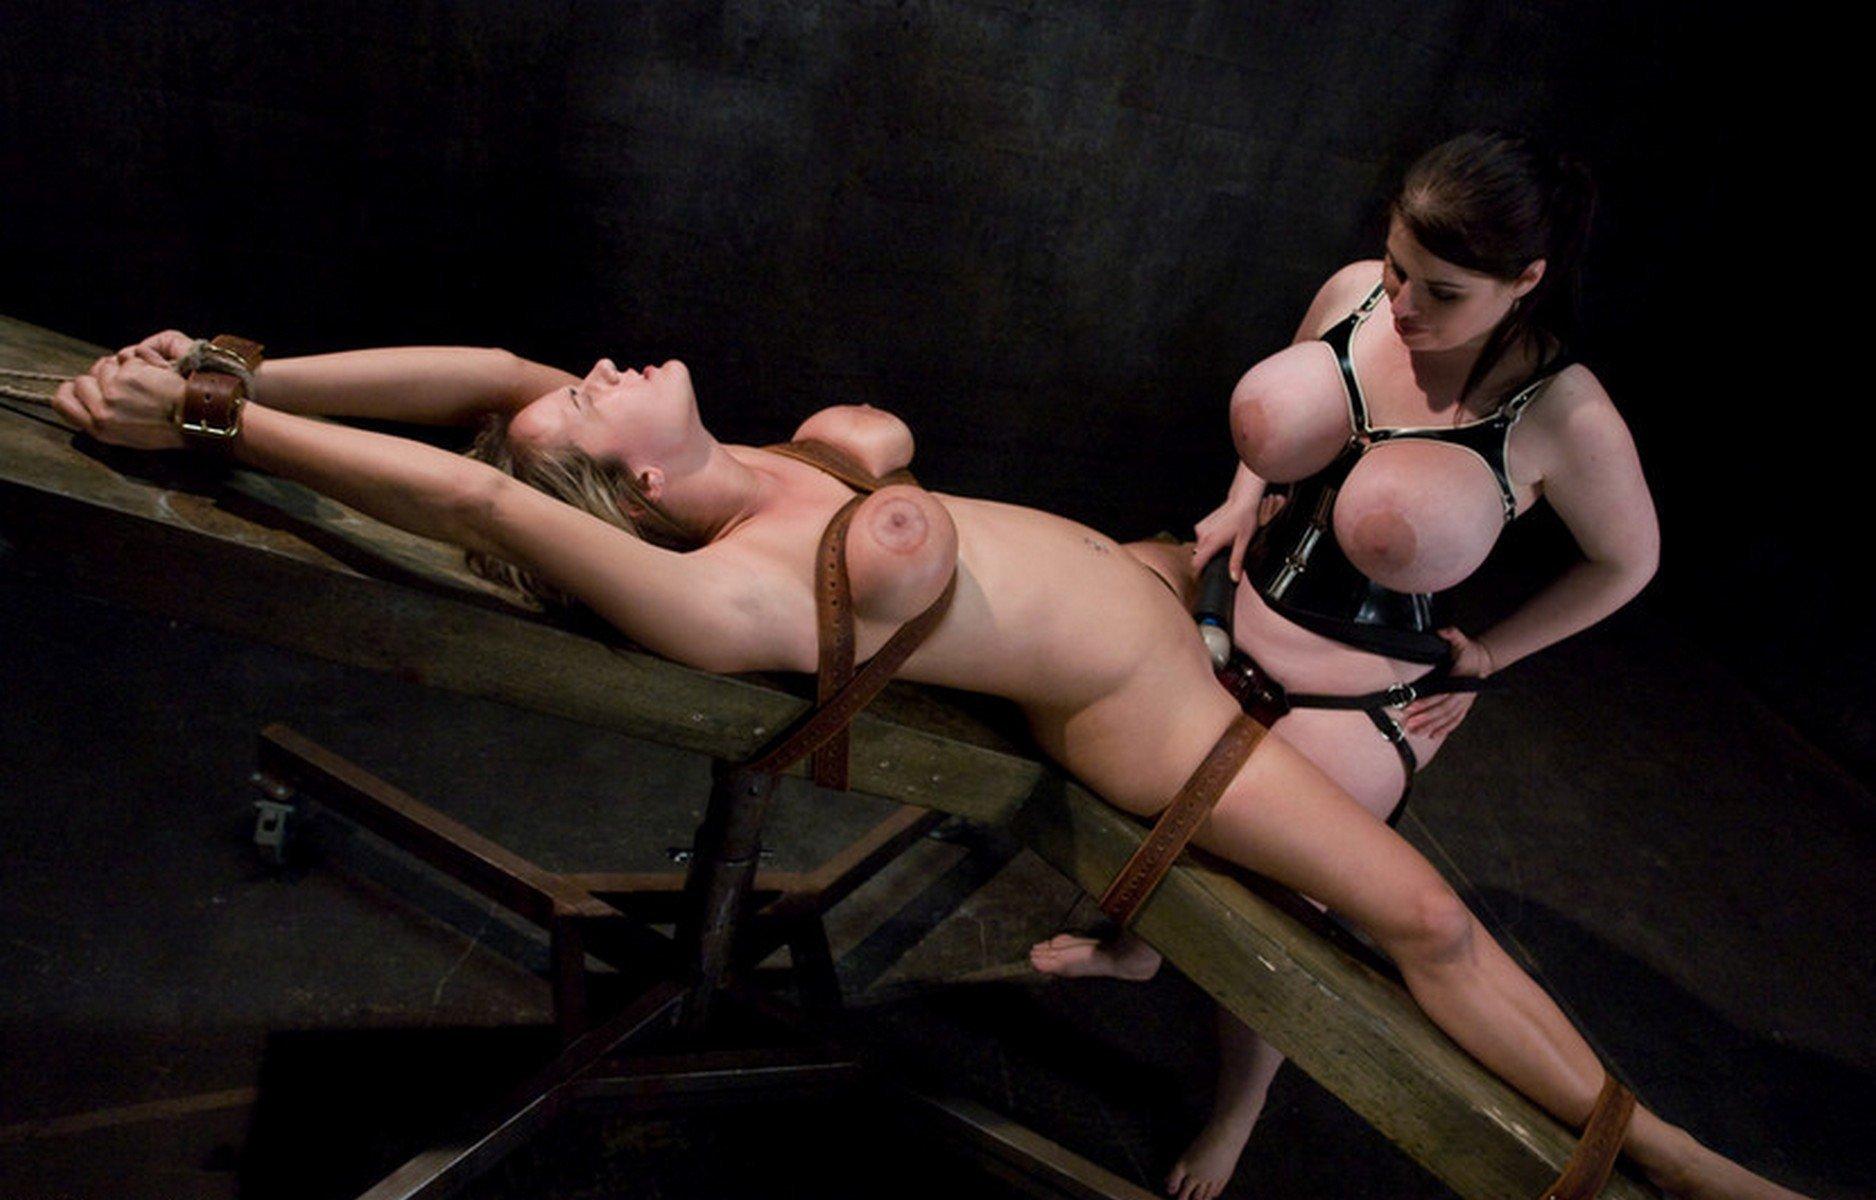 Bondage sex with an asian dildo for iroha suzumura